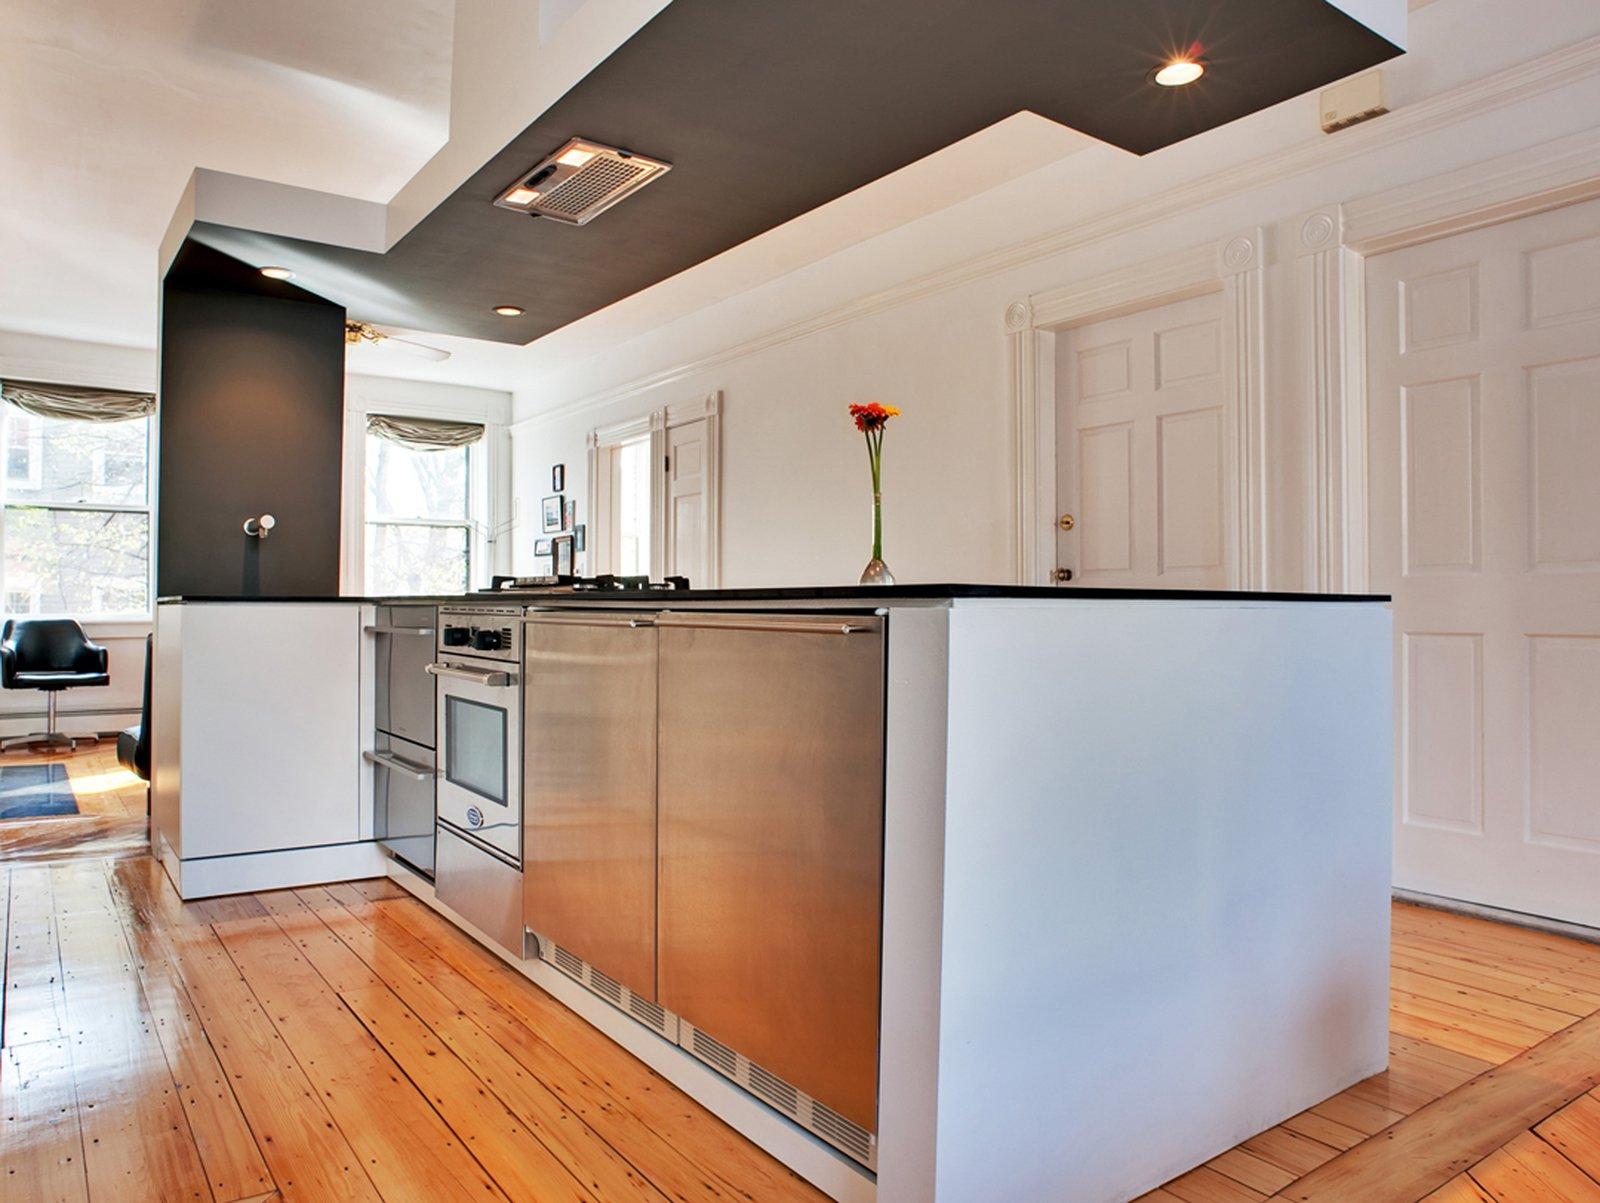 d house kitchen renovation by miyoko ohtake photo 5 of 8 dwell